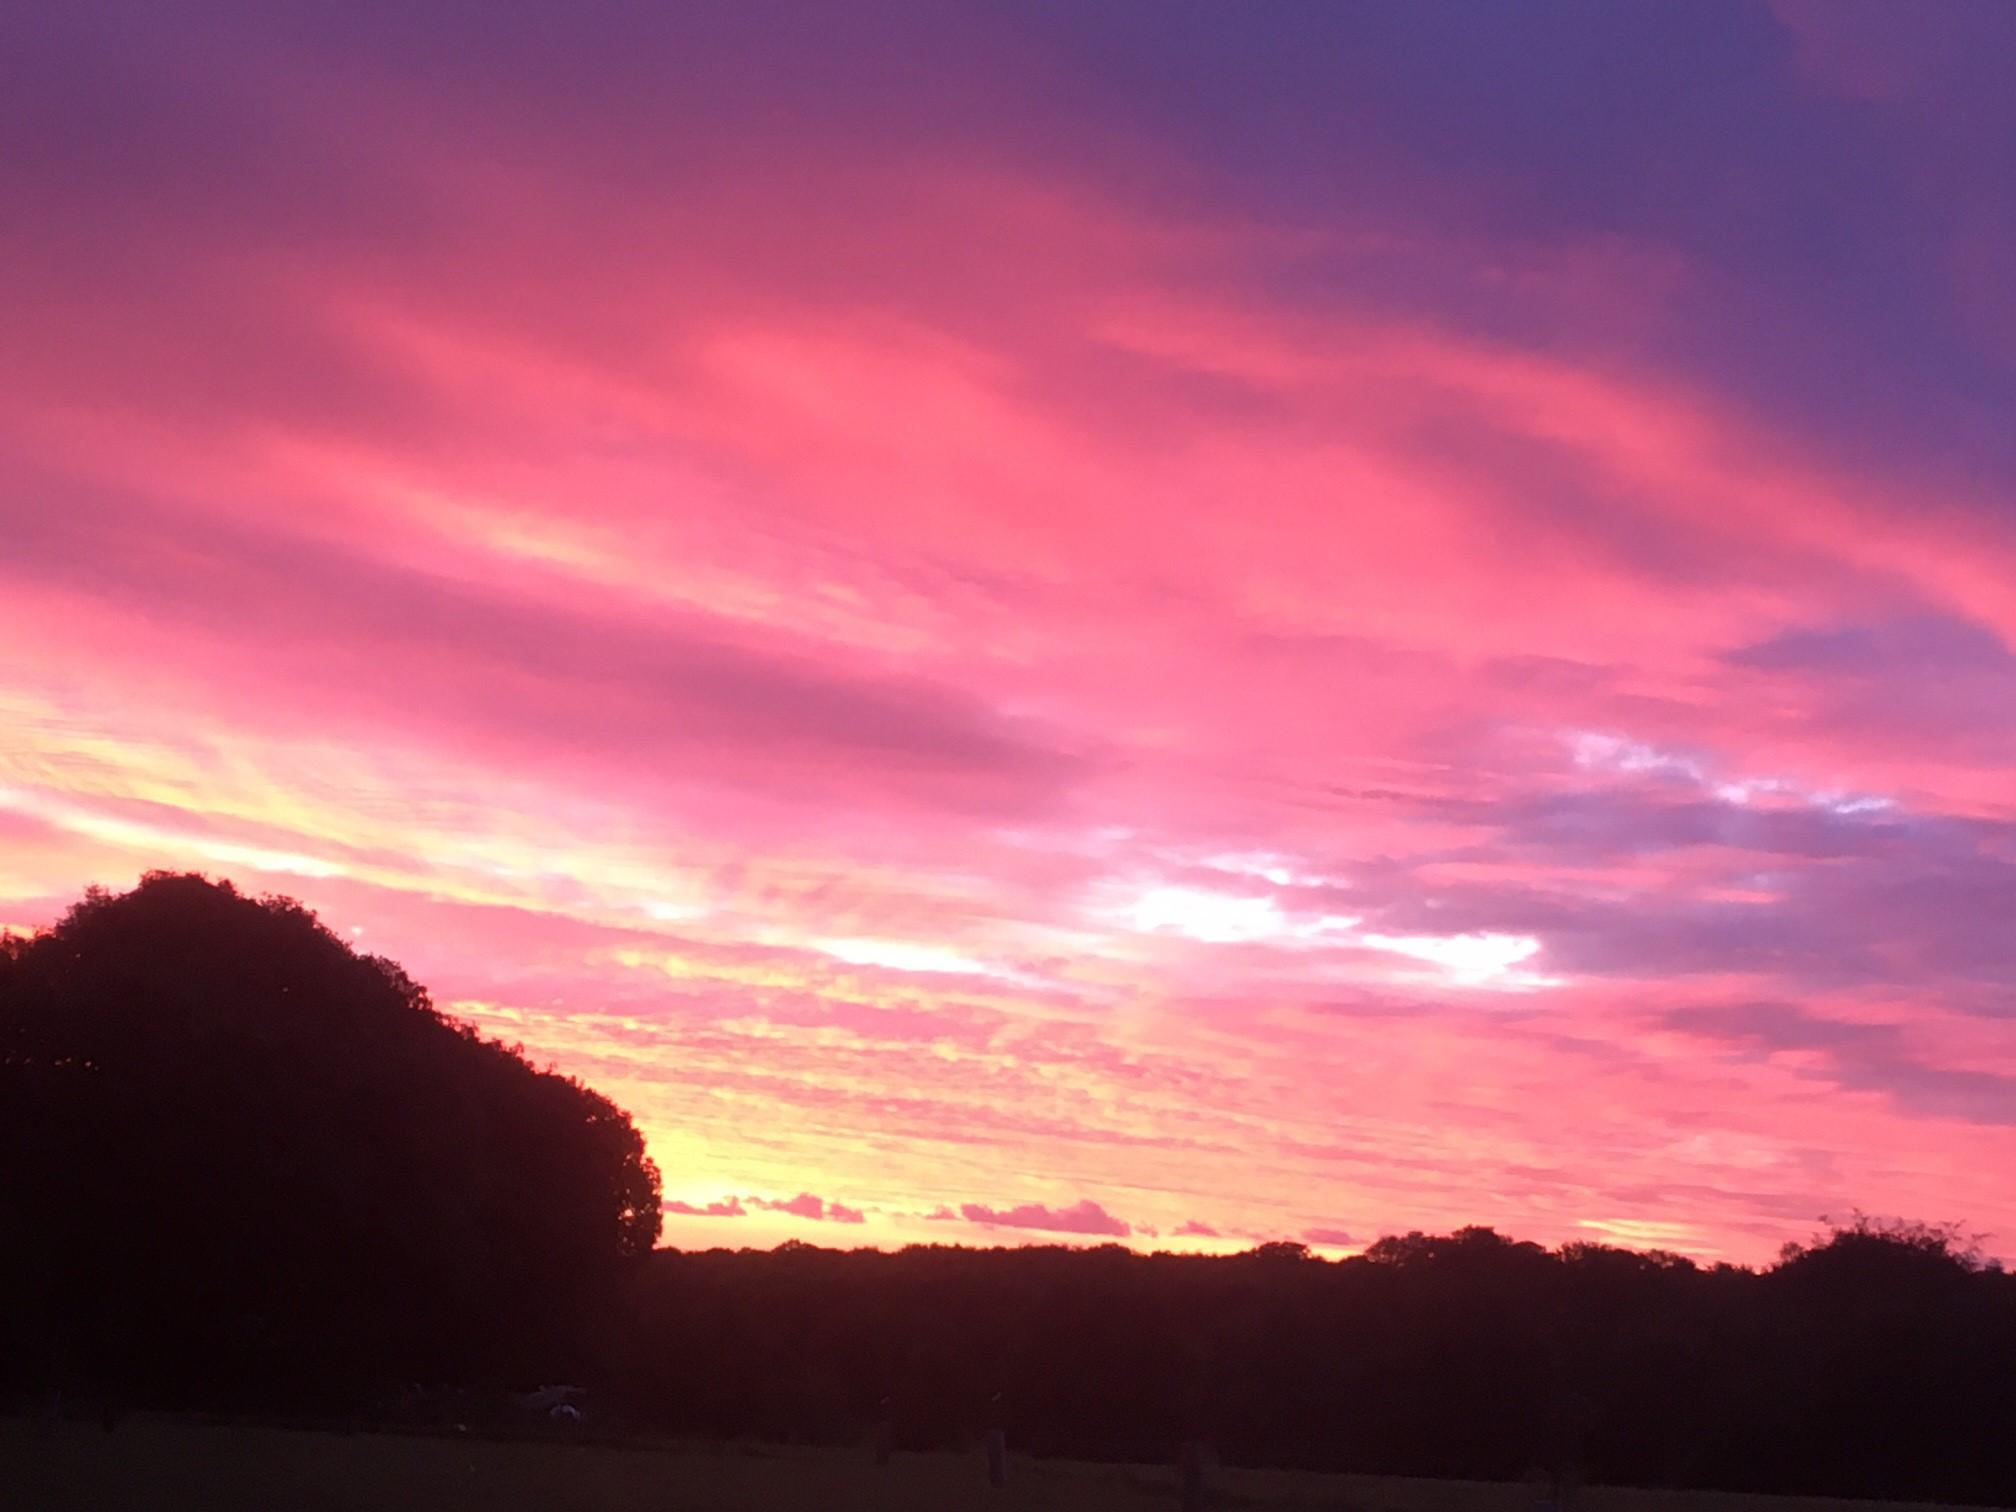 Seriously stunning sunrise this morning 😍